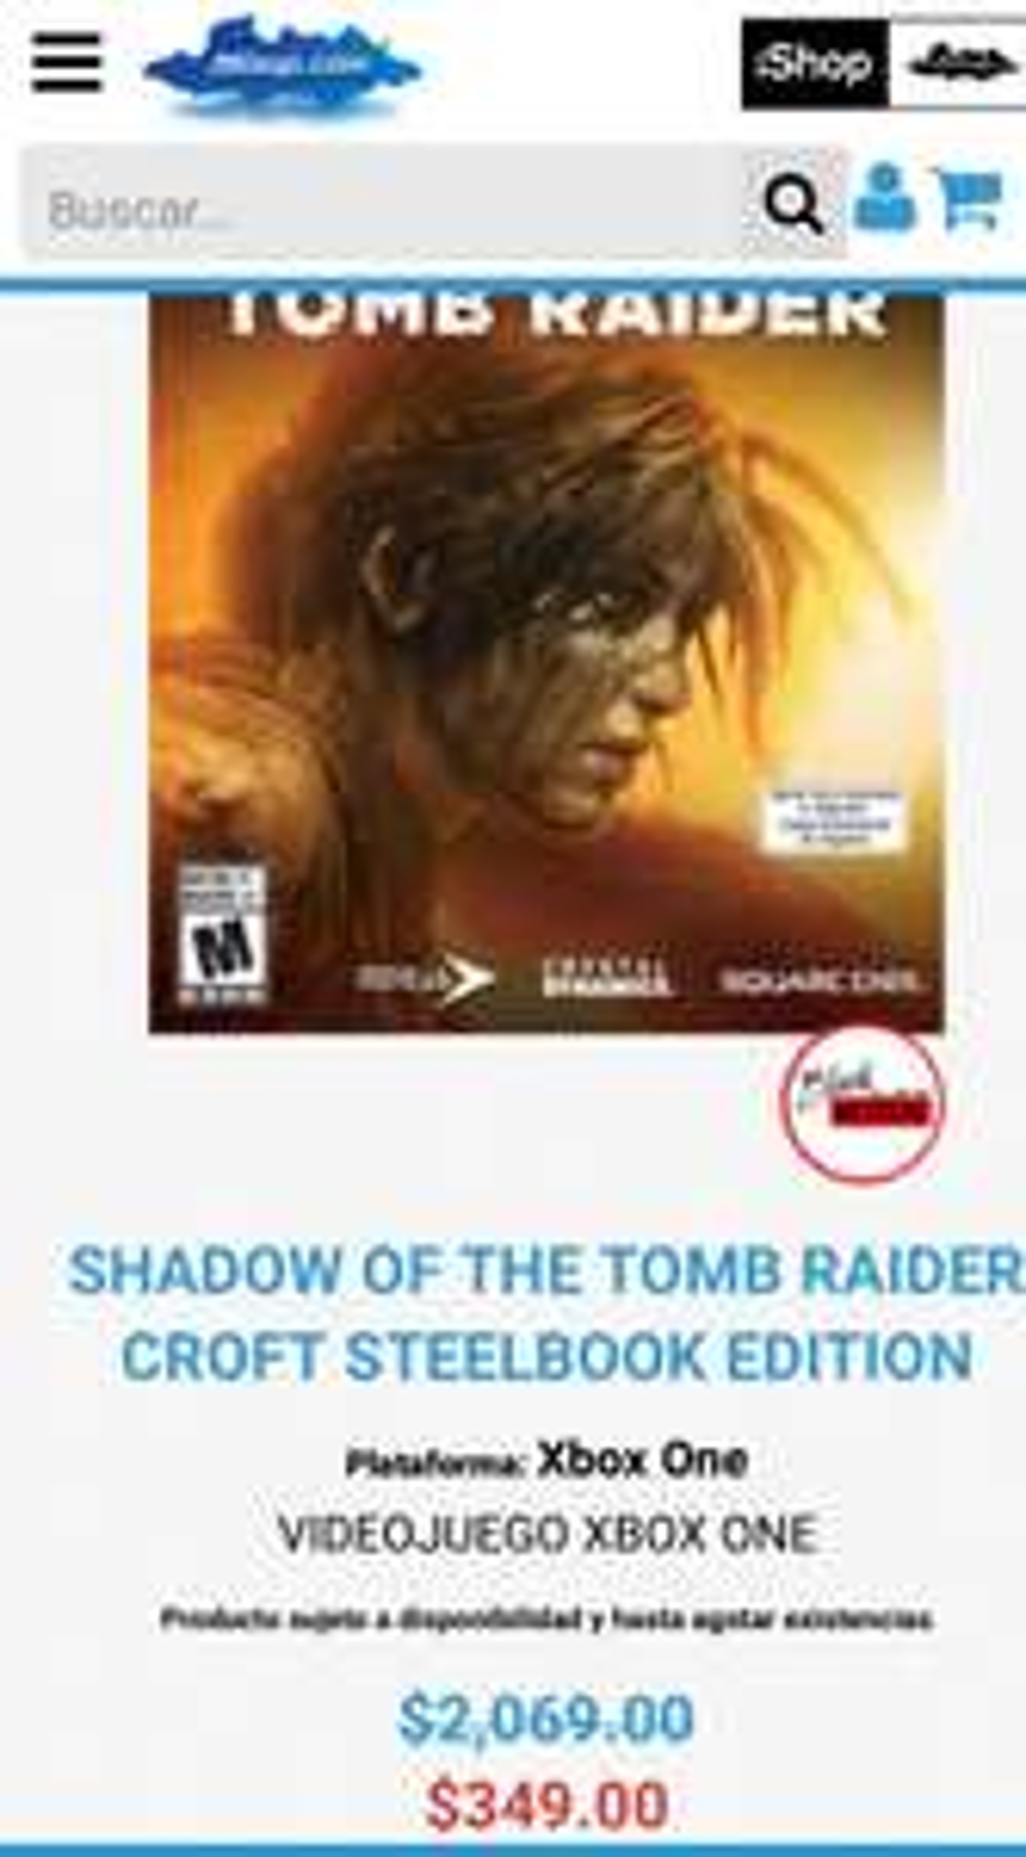 Mixup: shadow of the tomb rider edición Croft steelbook para Xbox one